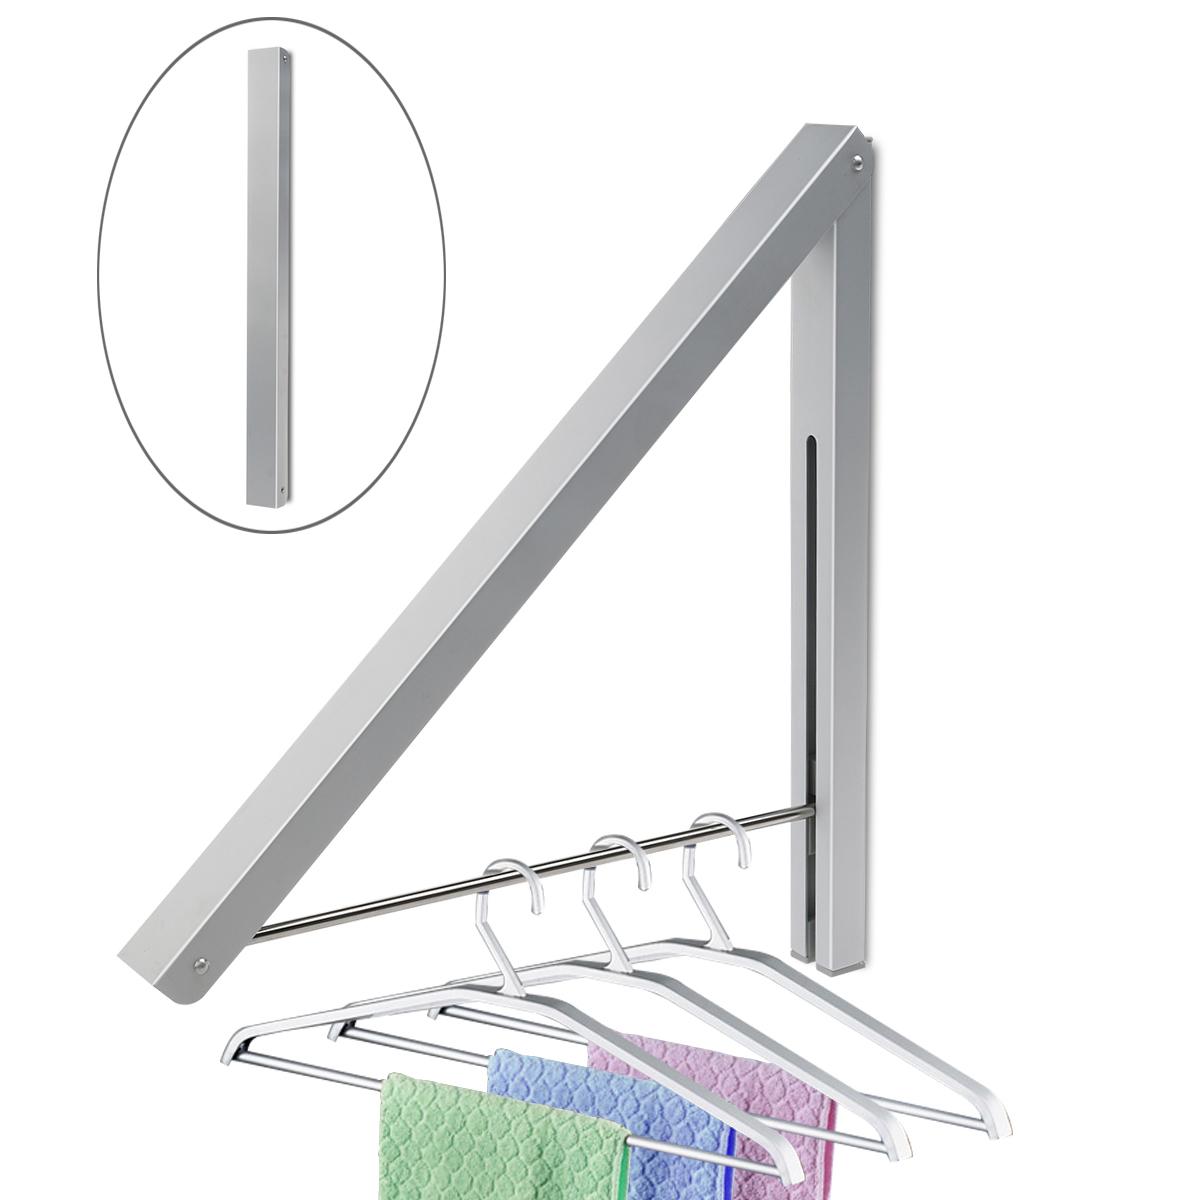 WINOMO Alumimum Wall Adjustable Clothes Hanger Rack Bracket for Laundry Organization Closet Storage System (Silver)(China (Mainland))